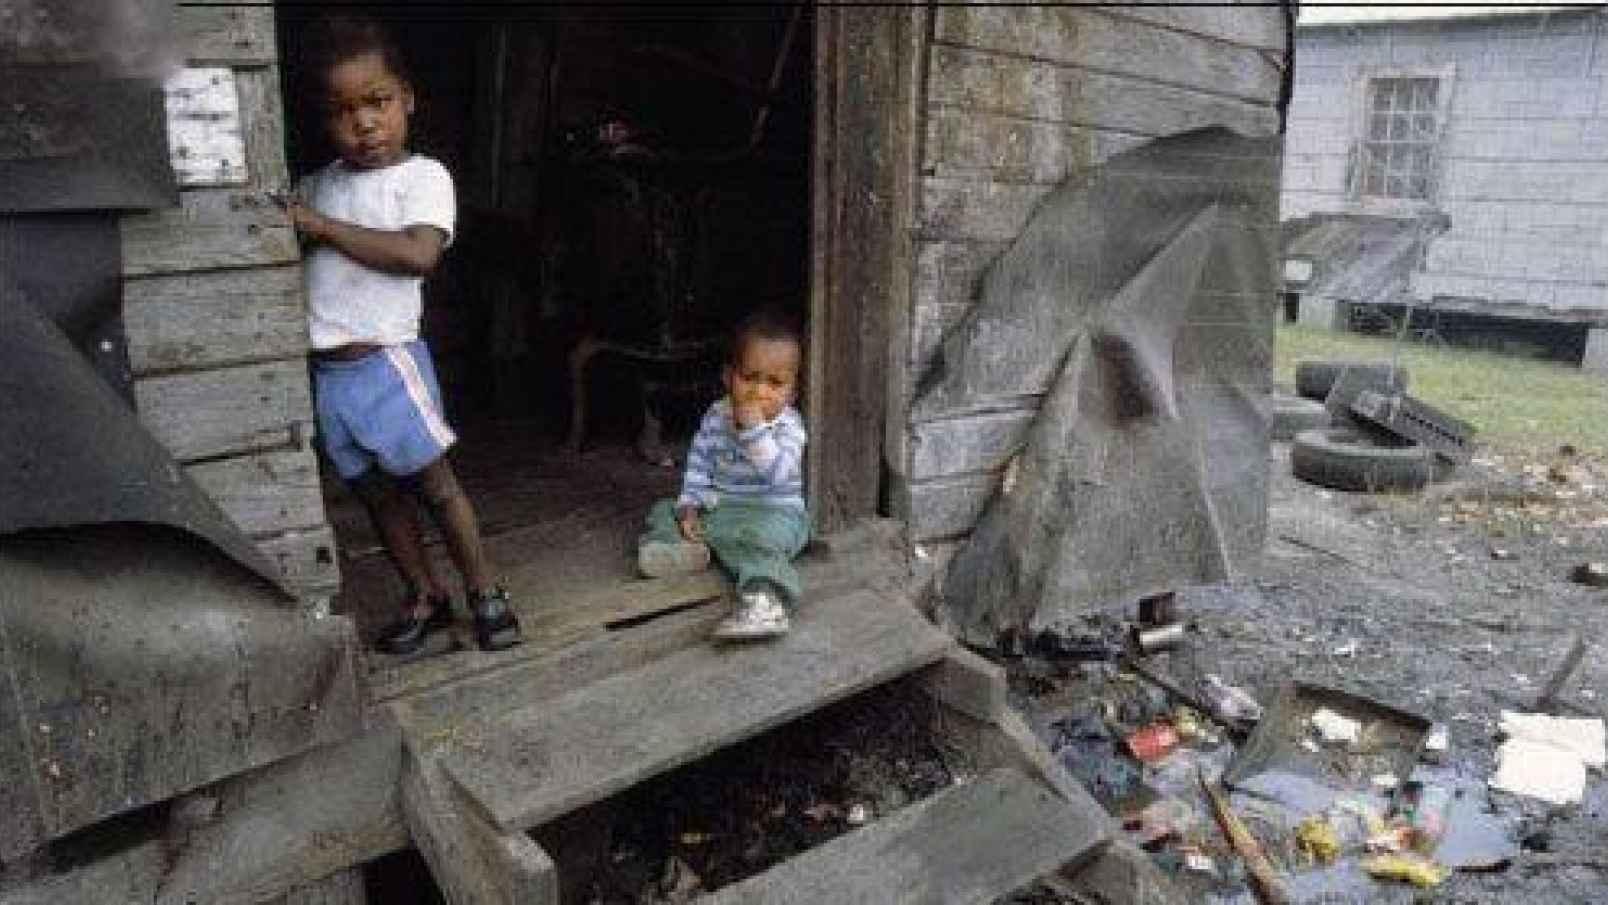 Child poverty in america essay